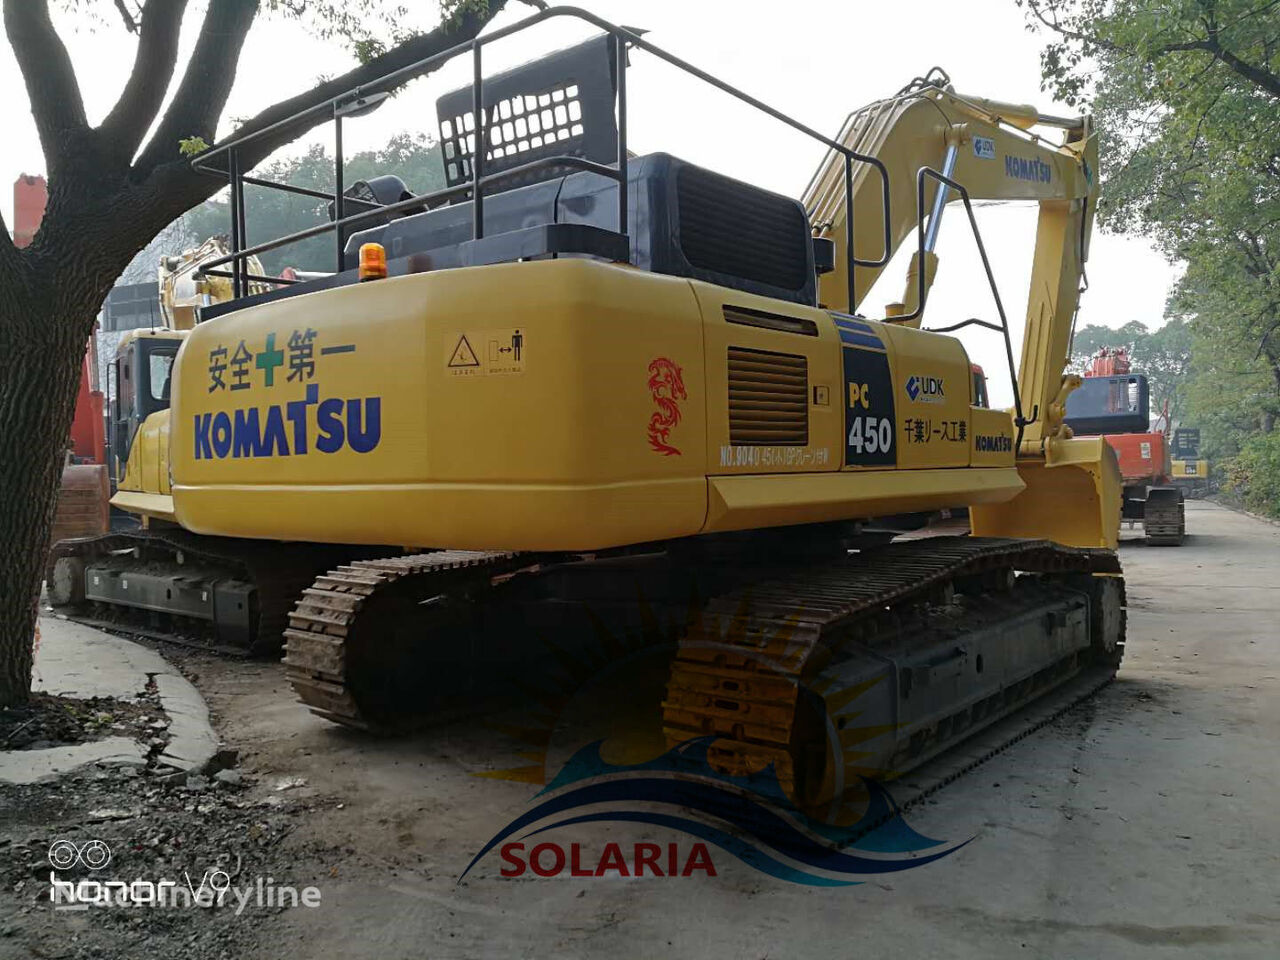 KOMATSU PC450-8 excavadora de cadenas